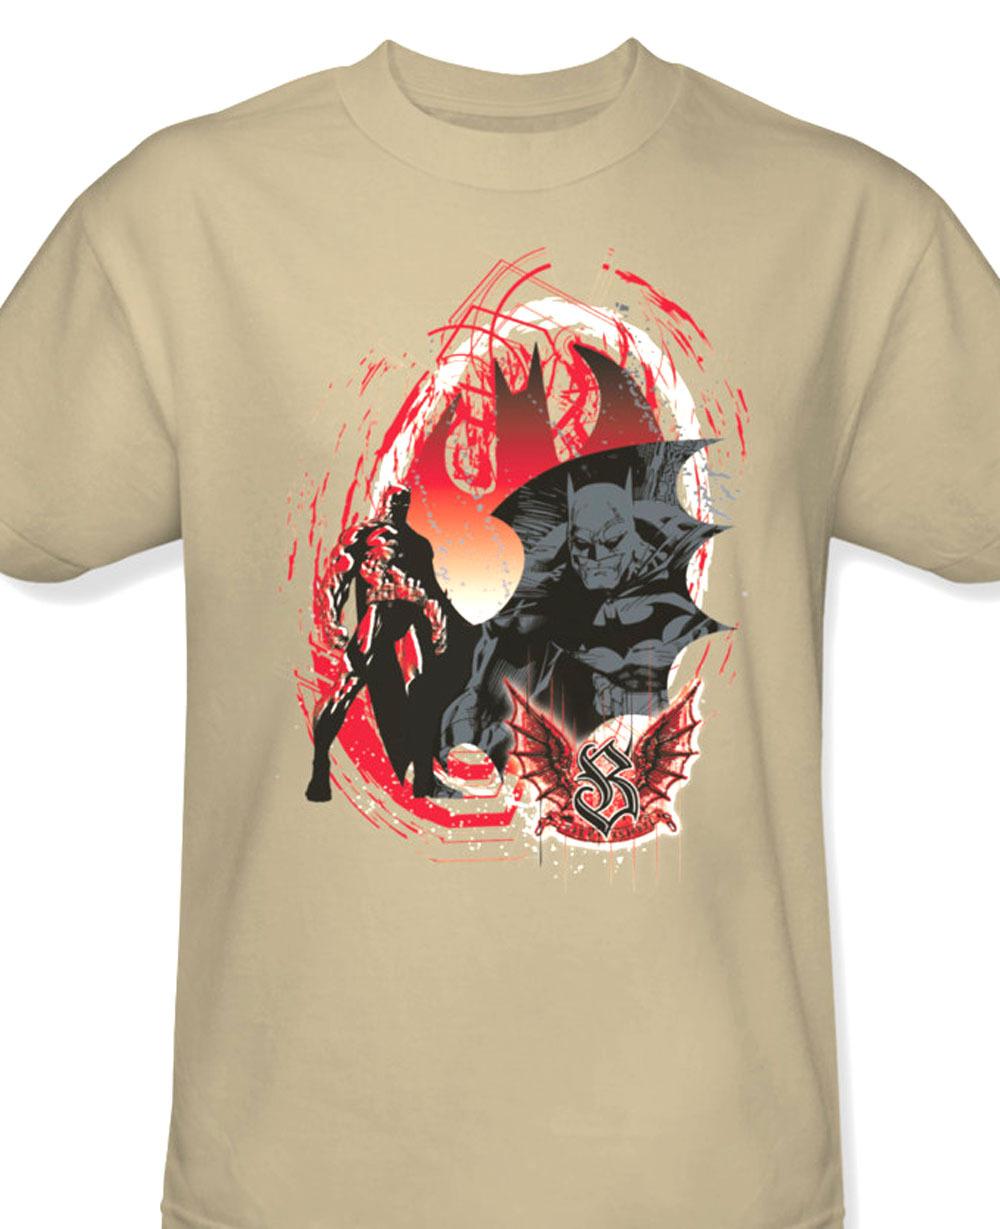 M1277 at batman the dark knight dc comics tee gotham city for sale online natural graphic tshirt